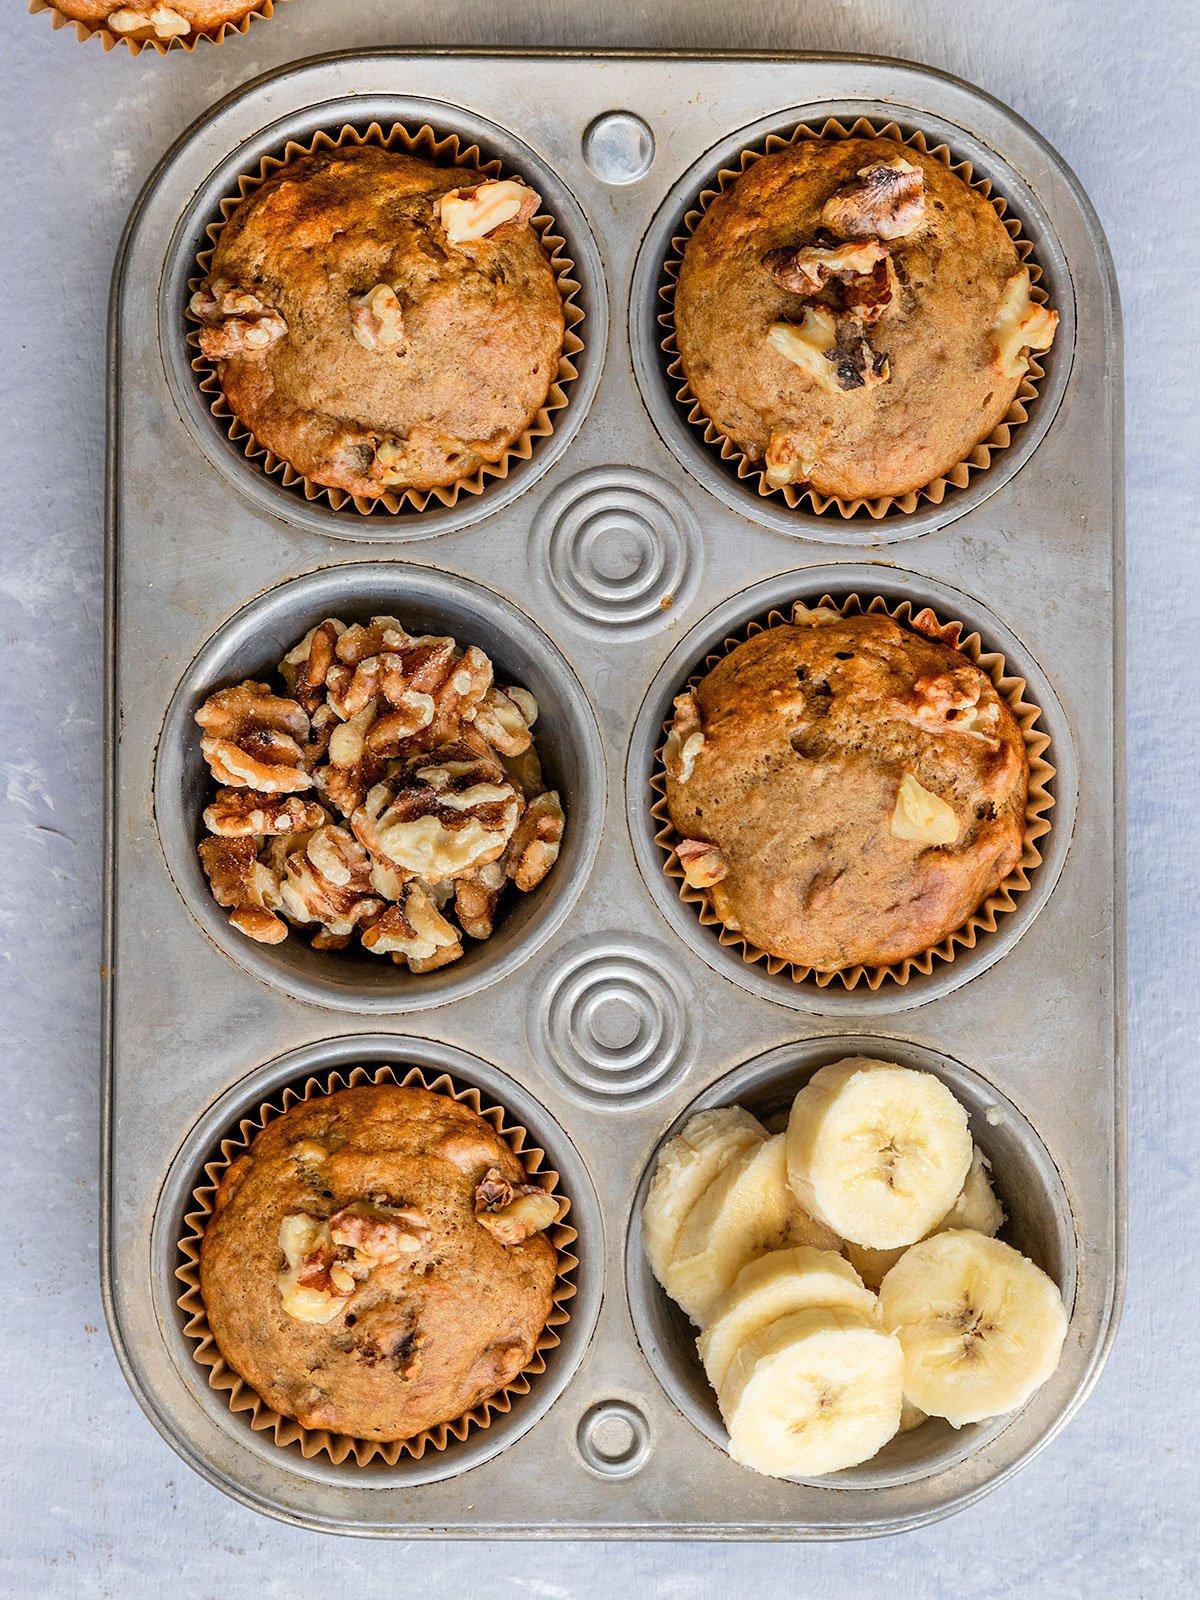 muffin tin full of banana muffins, walnuts, and banana slices